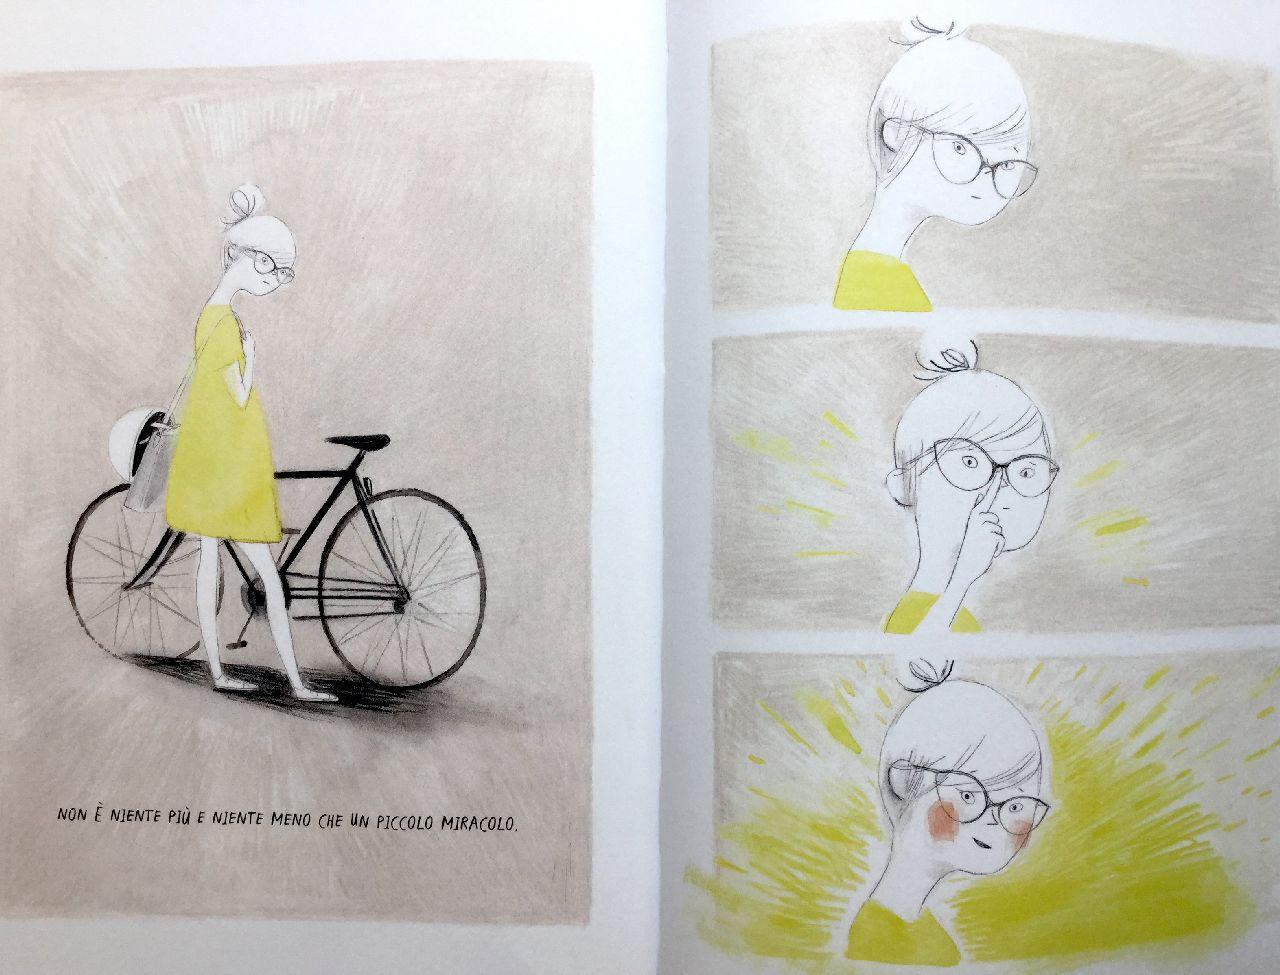 Fanny Britt - Isabelle Arsenault, Louis e i suoi fantasmi, Mondadori